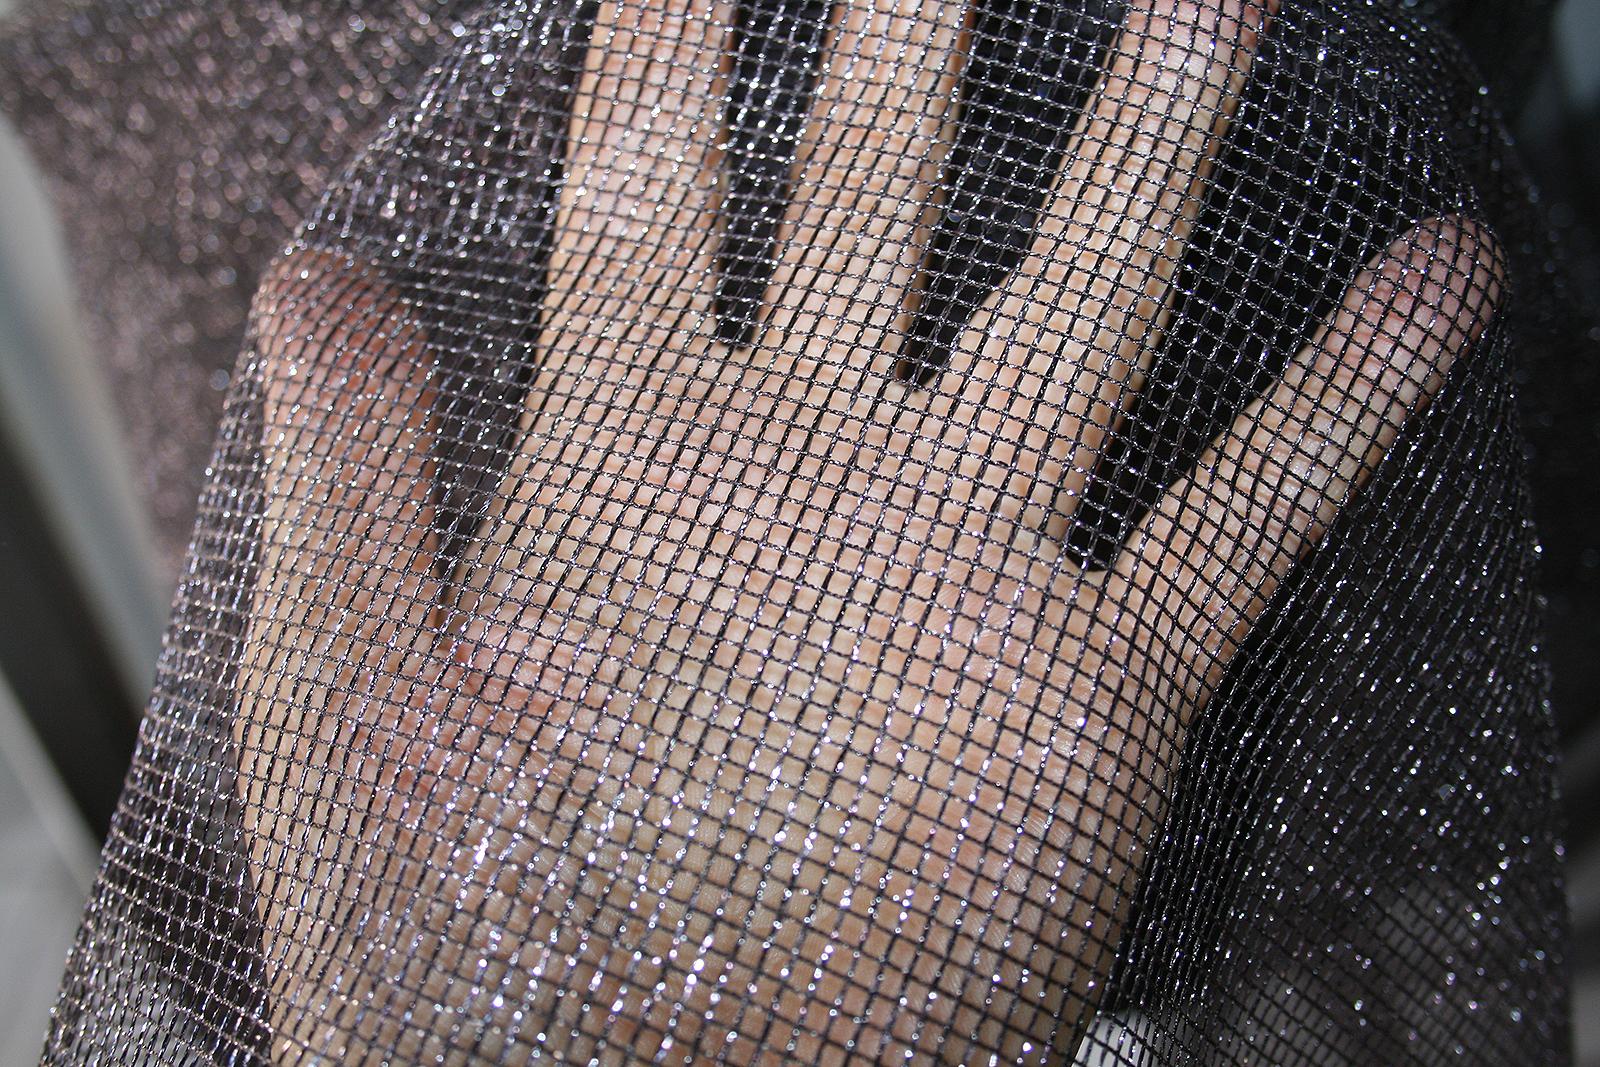 Metallic Brown Tulle Fabric Netting Tutus Skirts Veils